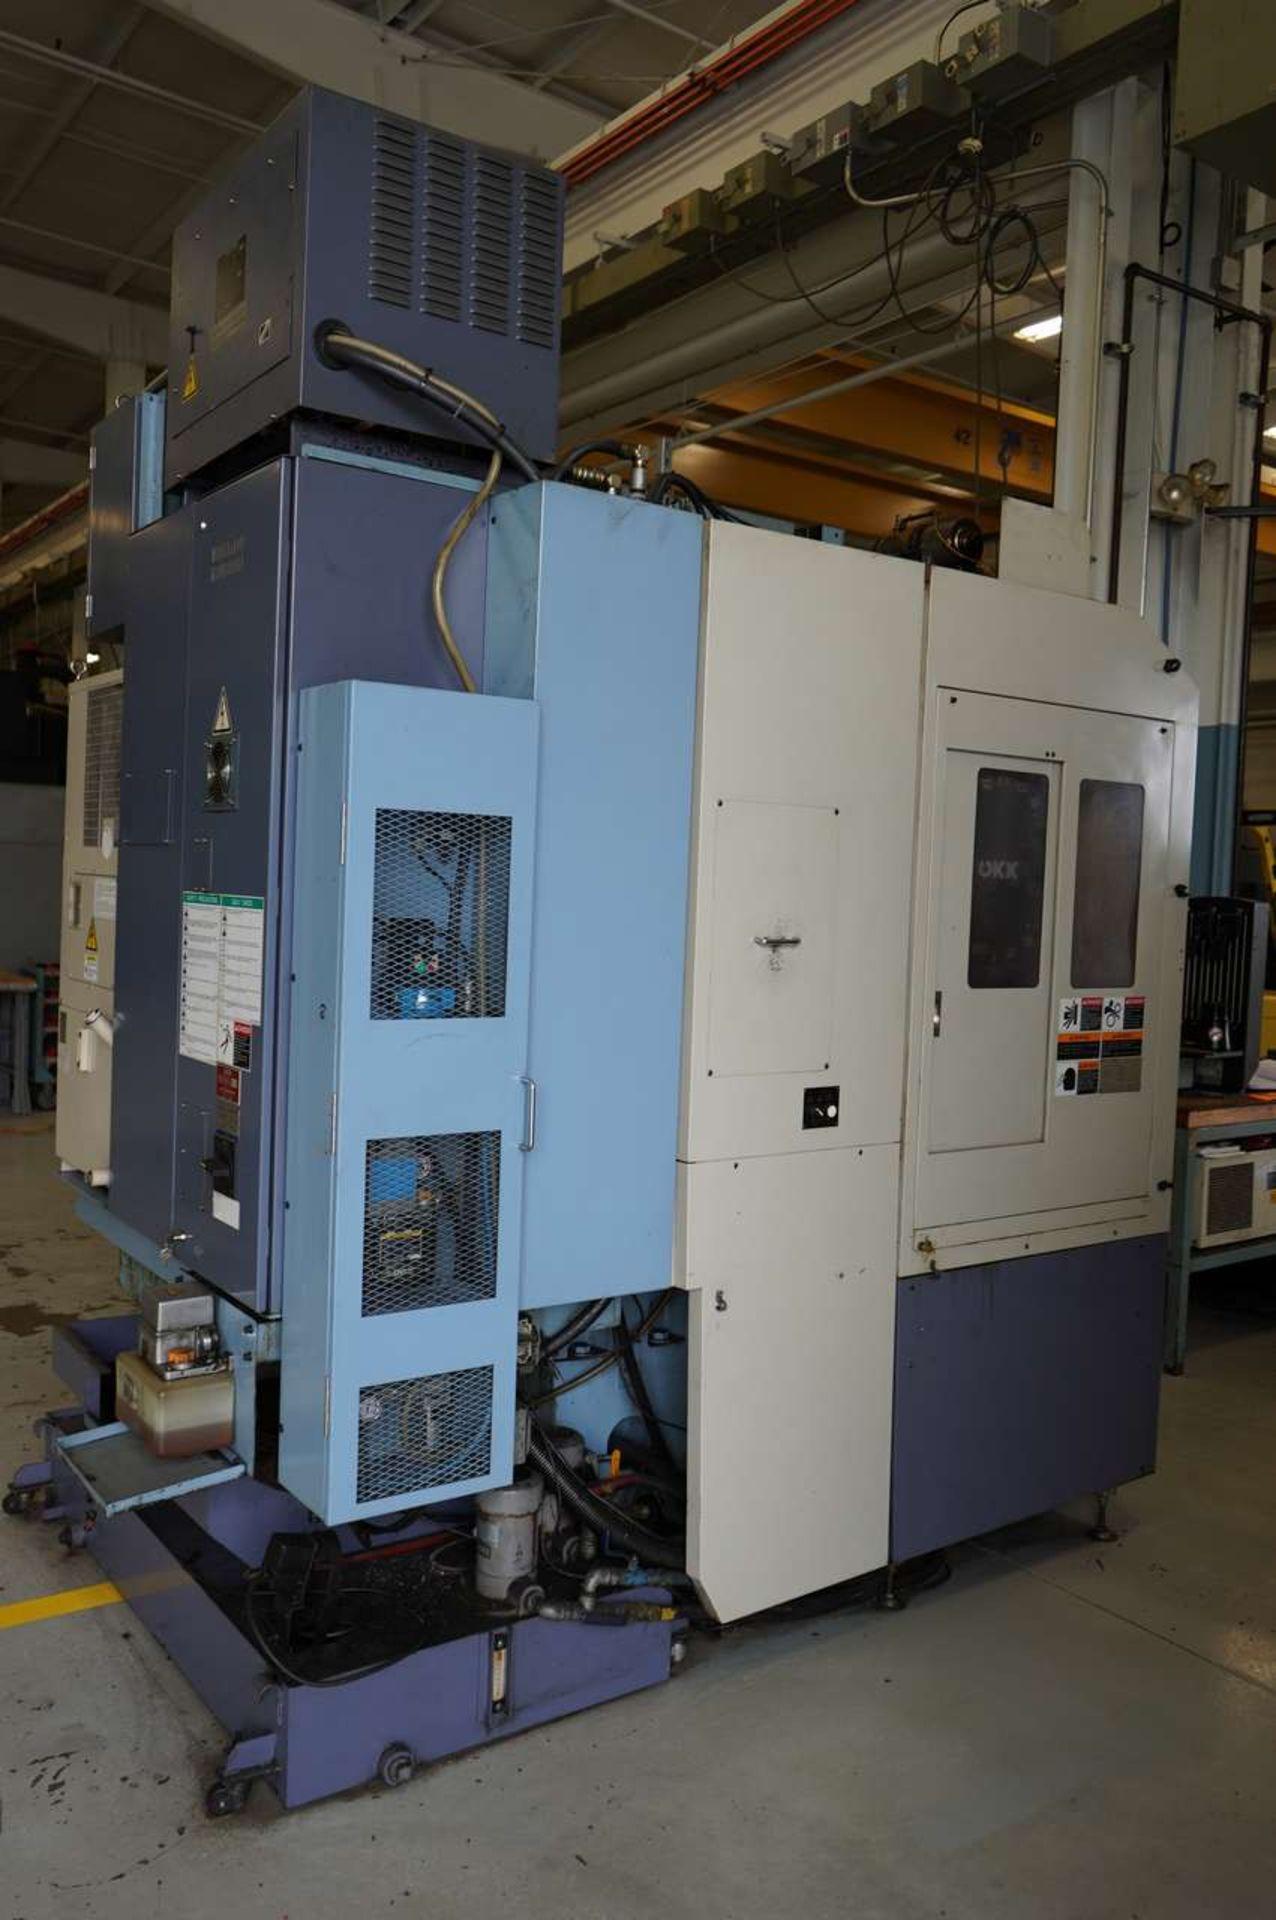 Lot 32 - 2005 OKK PG8 CNC Vertical Machining Center